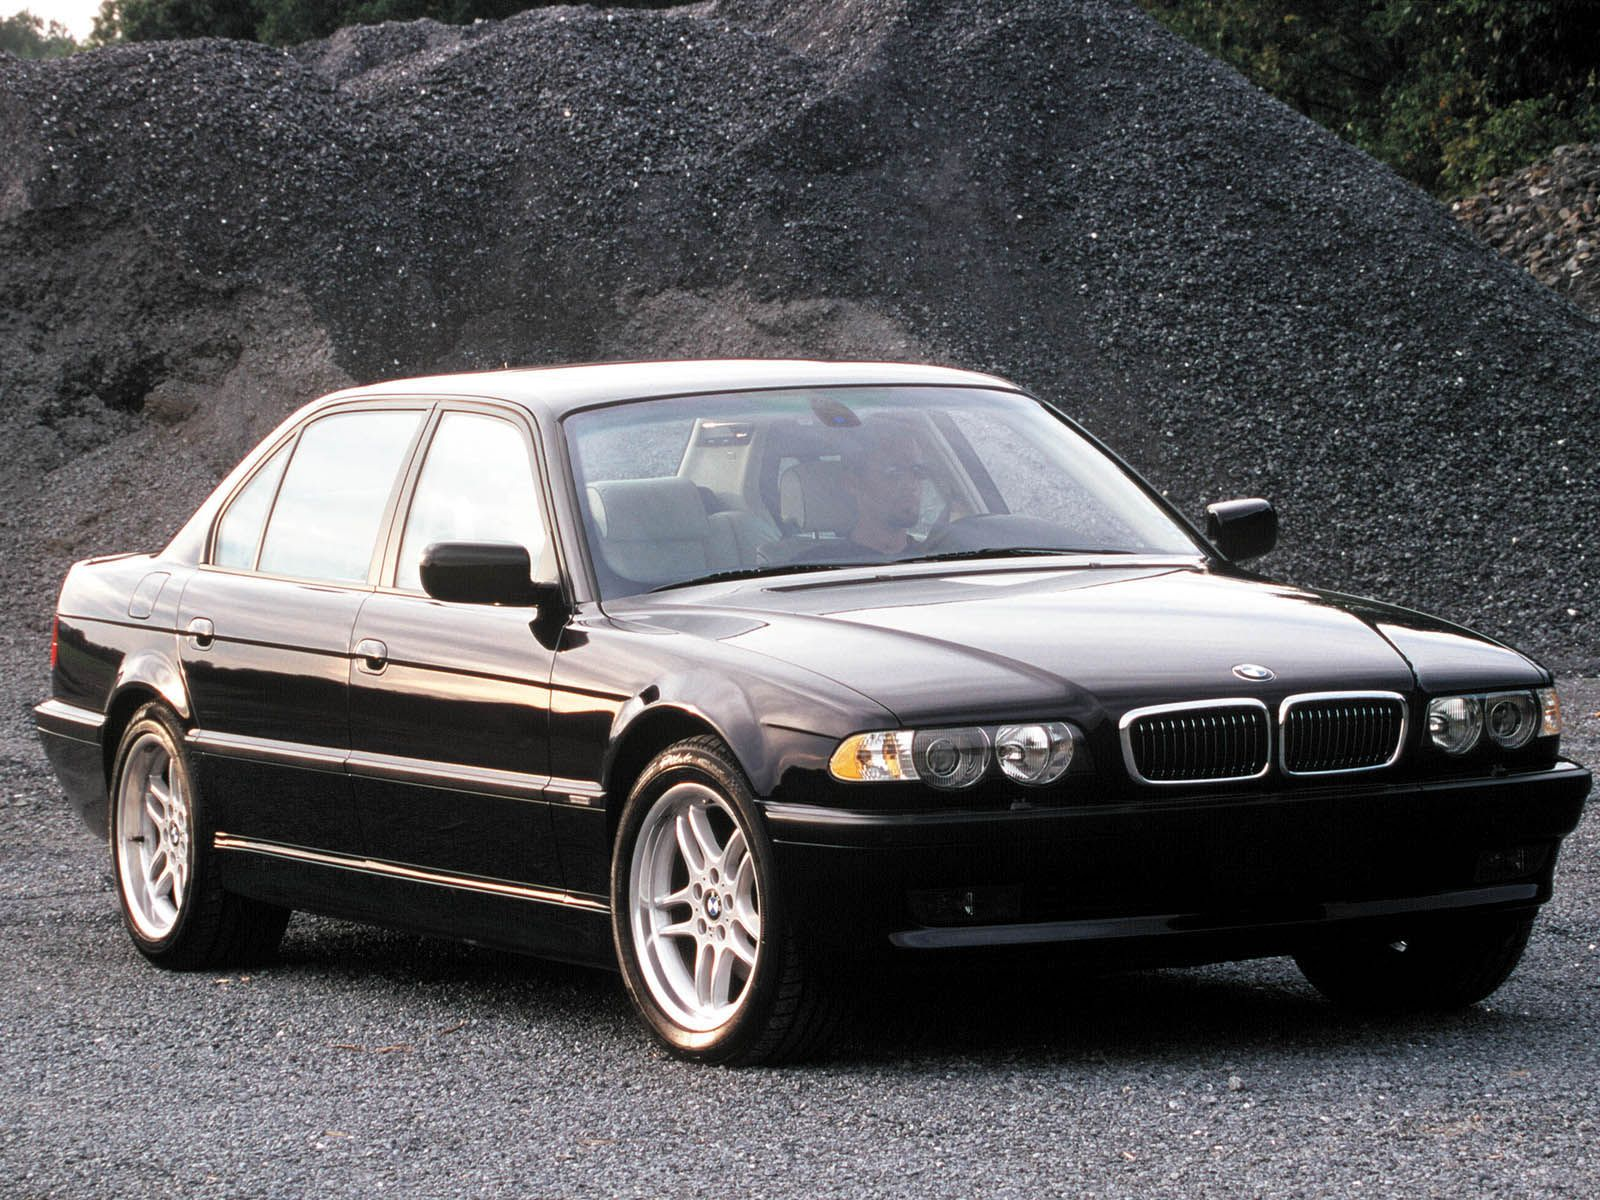 BMW Series BMW Series For Sale Carsforsalecom - 2009 bmw 745li for sale